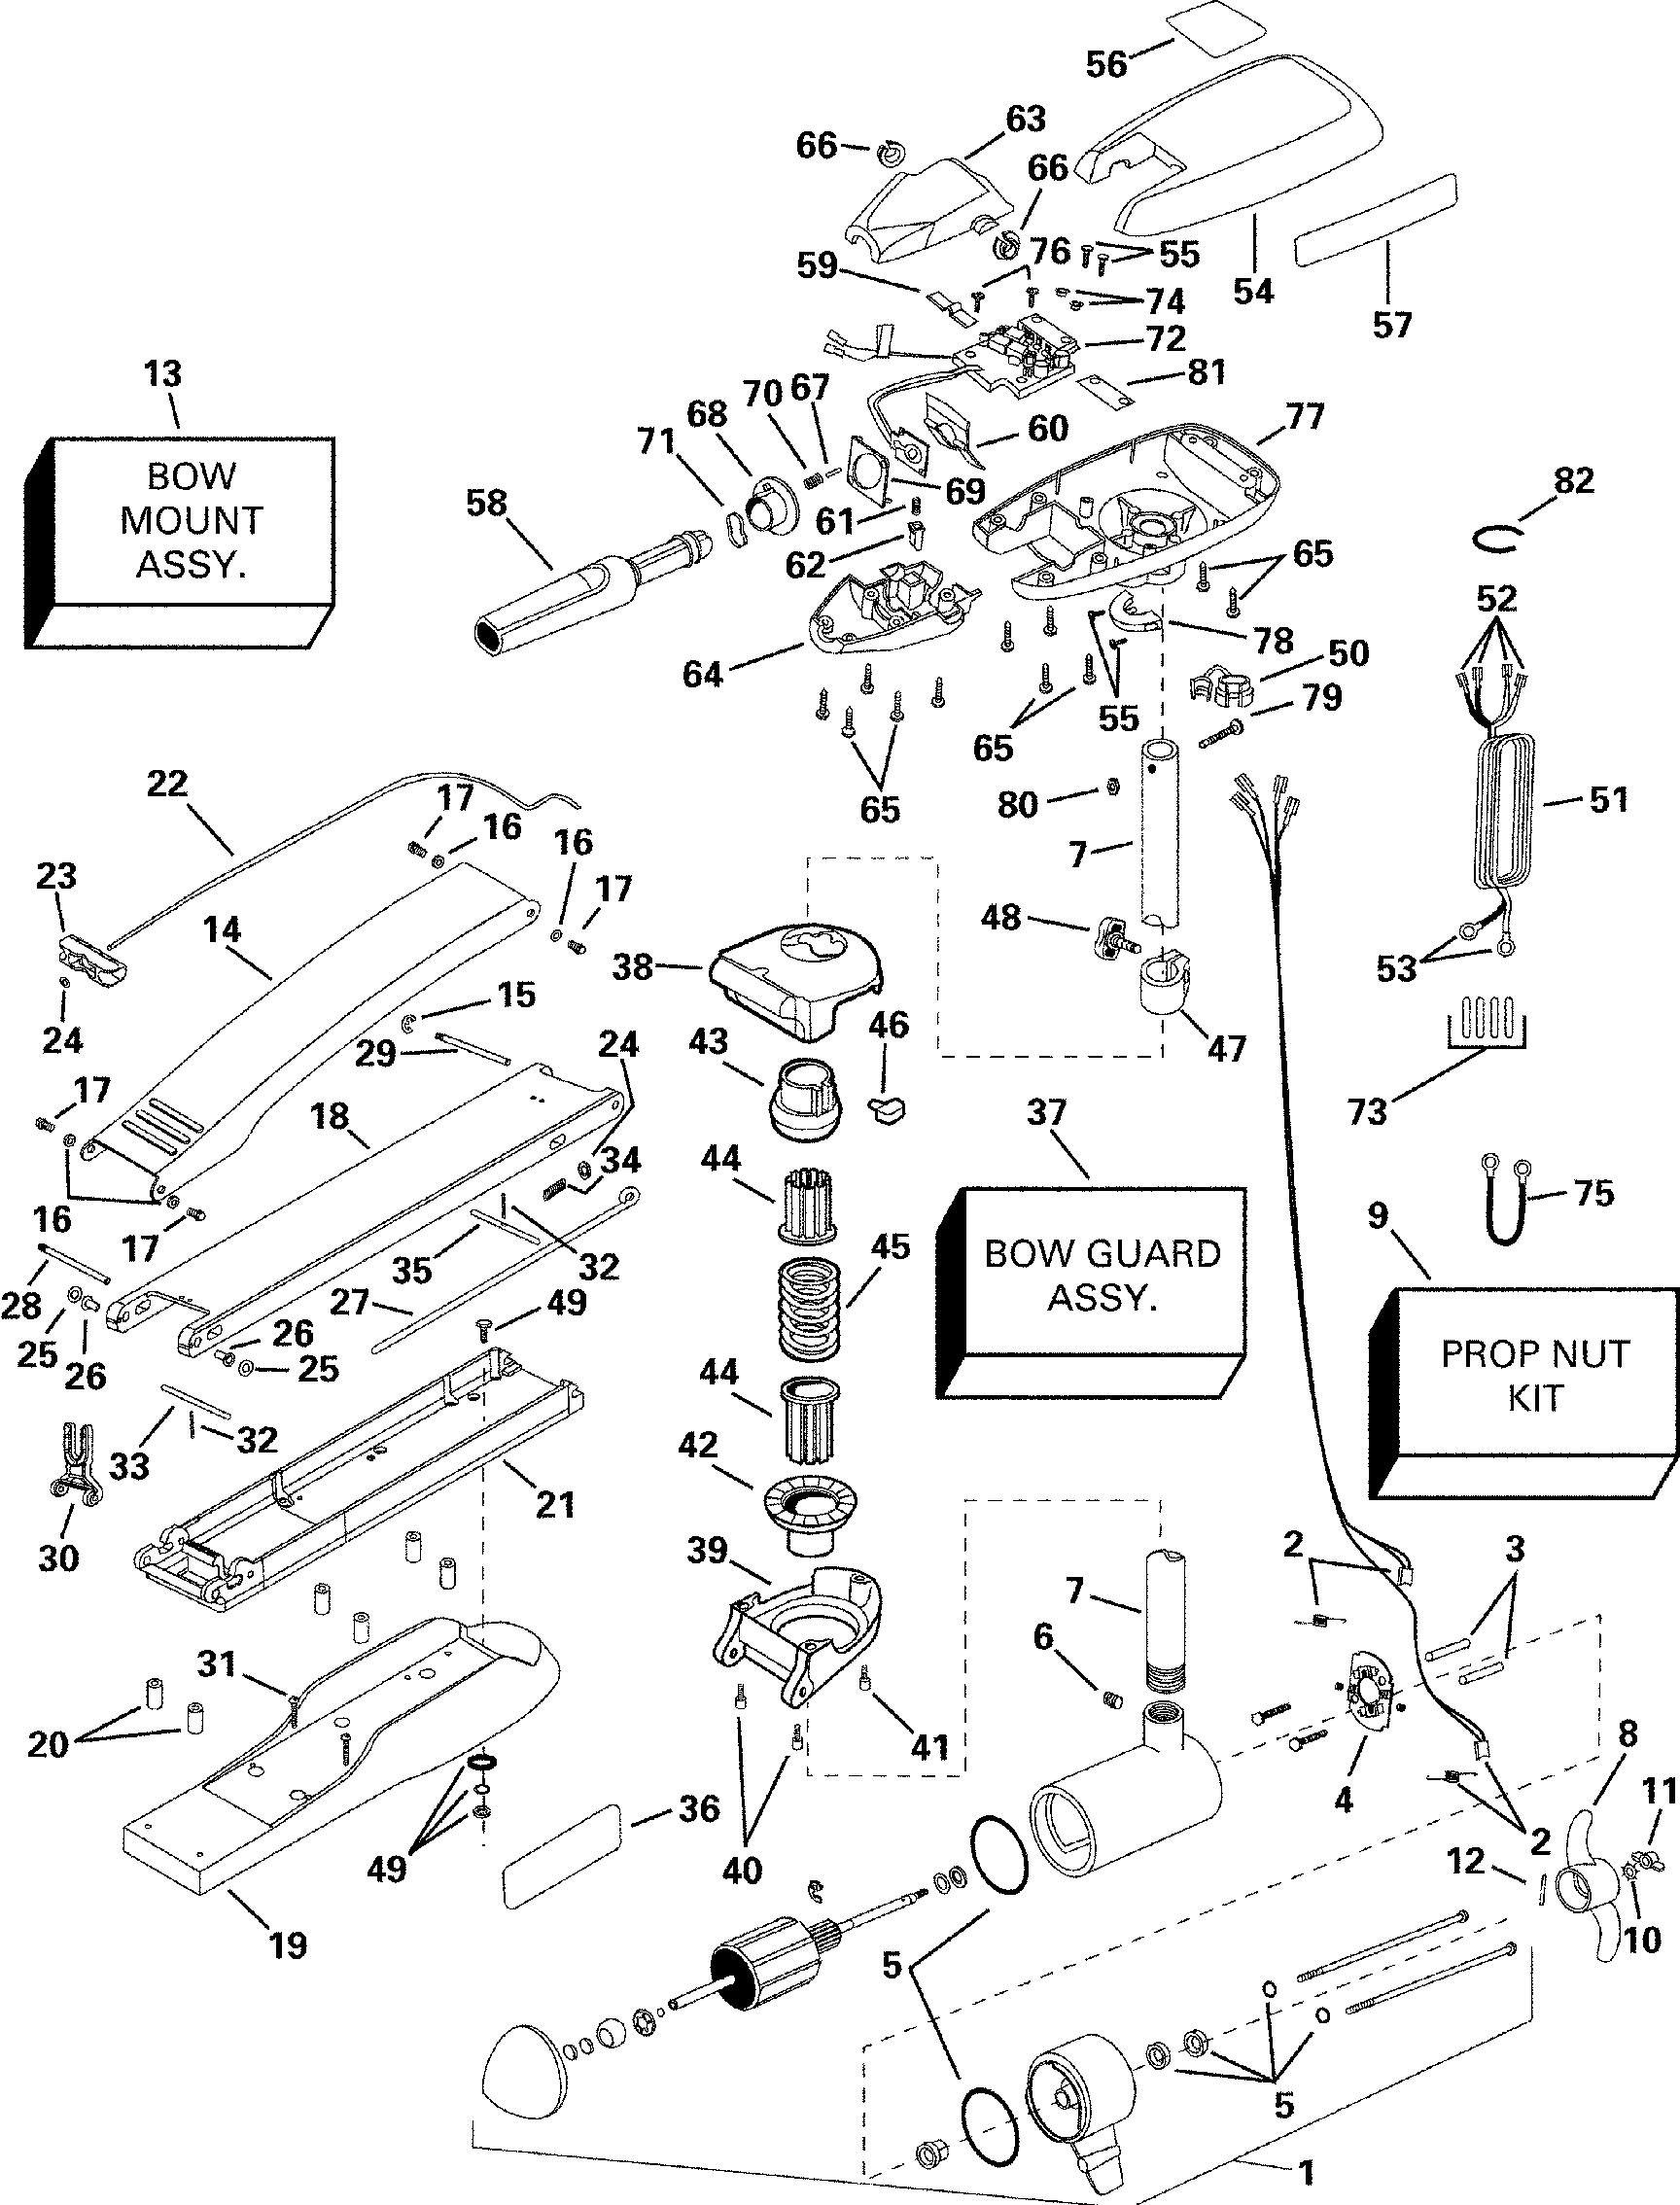 brp evinrude en 2000 12 volt p n 773162 scout 40h 2000 Kazuma Carburetor Diagram ref description qty required price 1 motor assembly